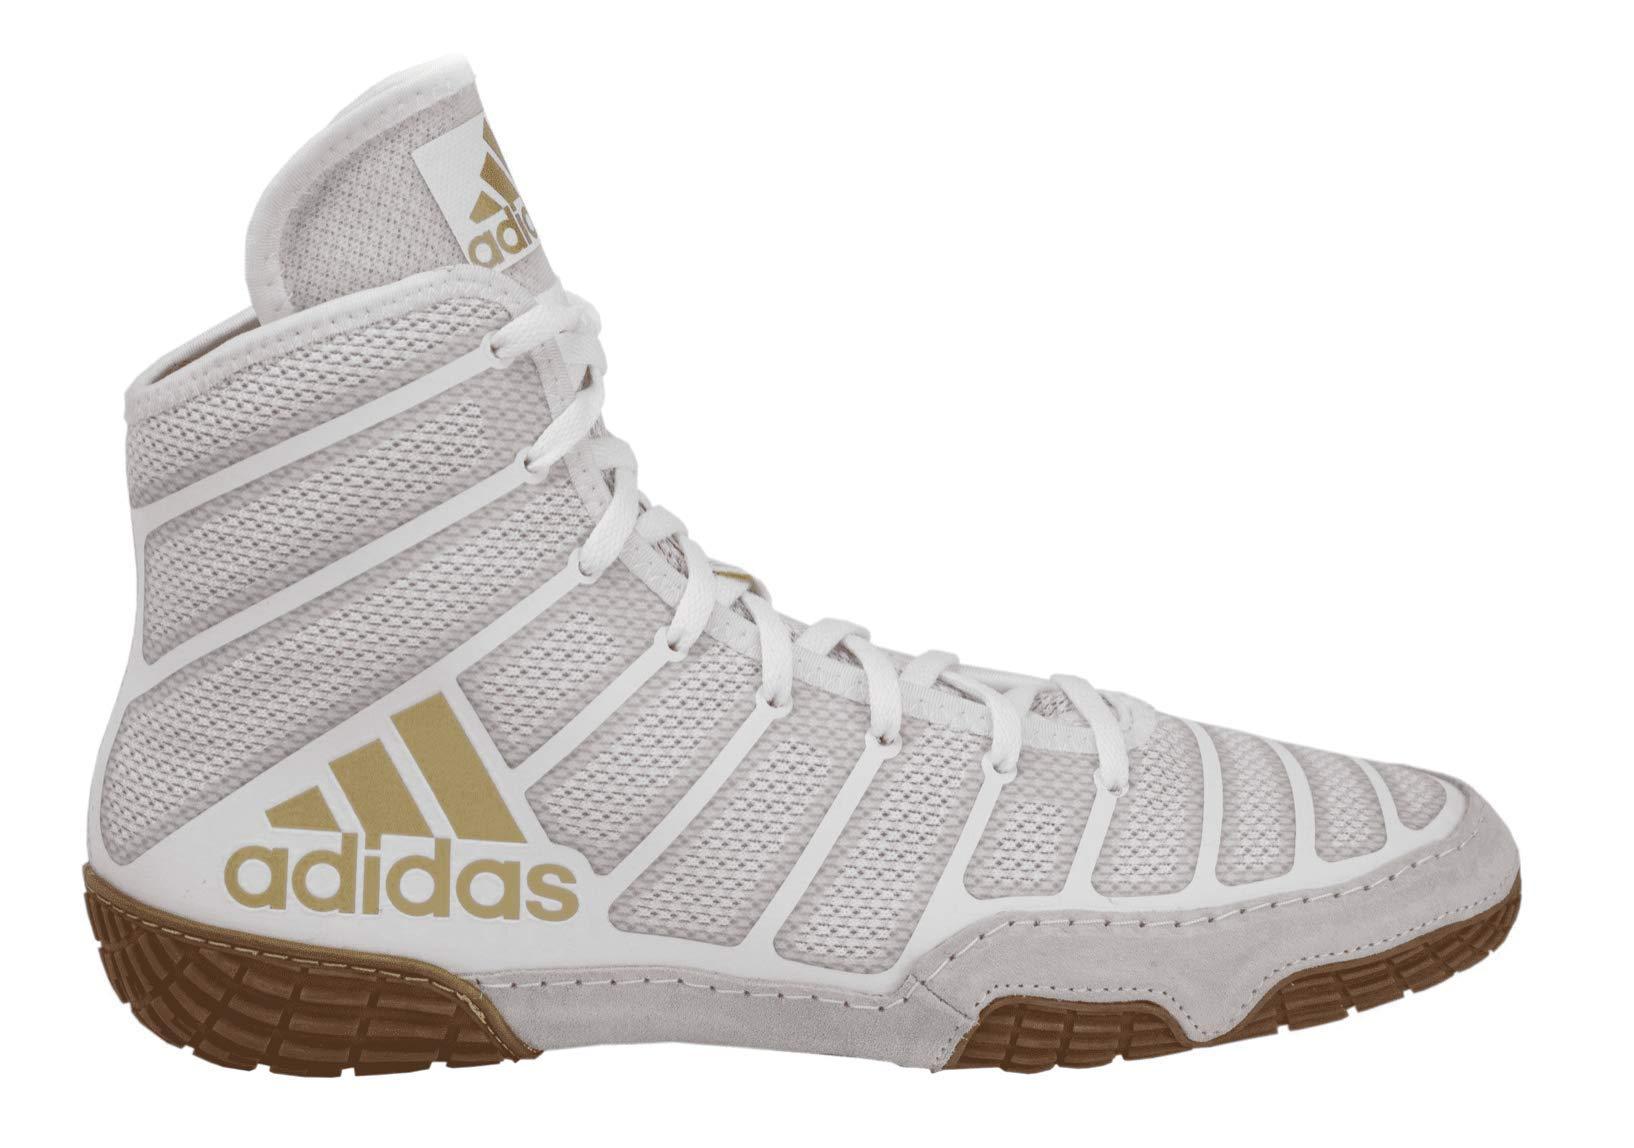 16a39a66481 Galleon - Adidas Adizero Varner Men s Wrestling Shoes